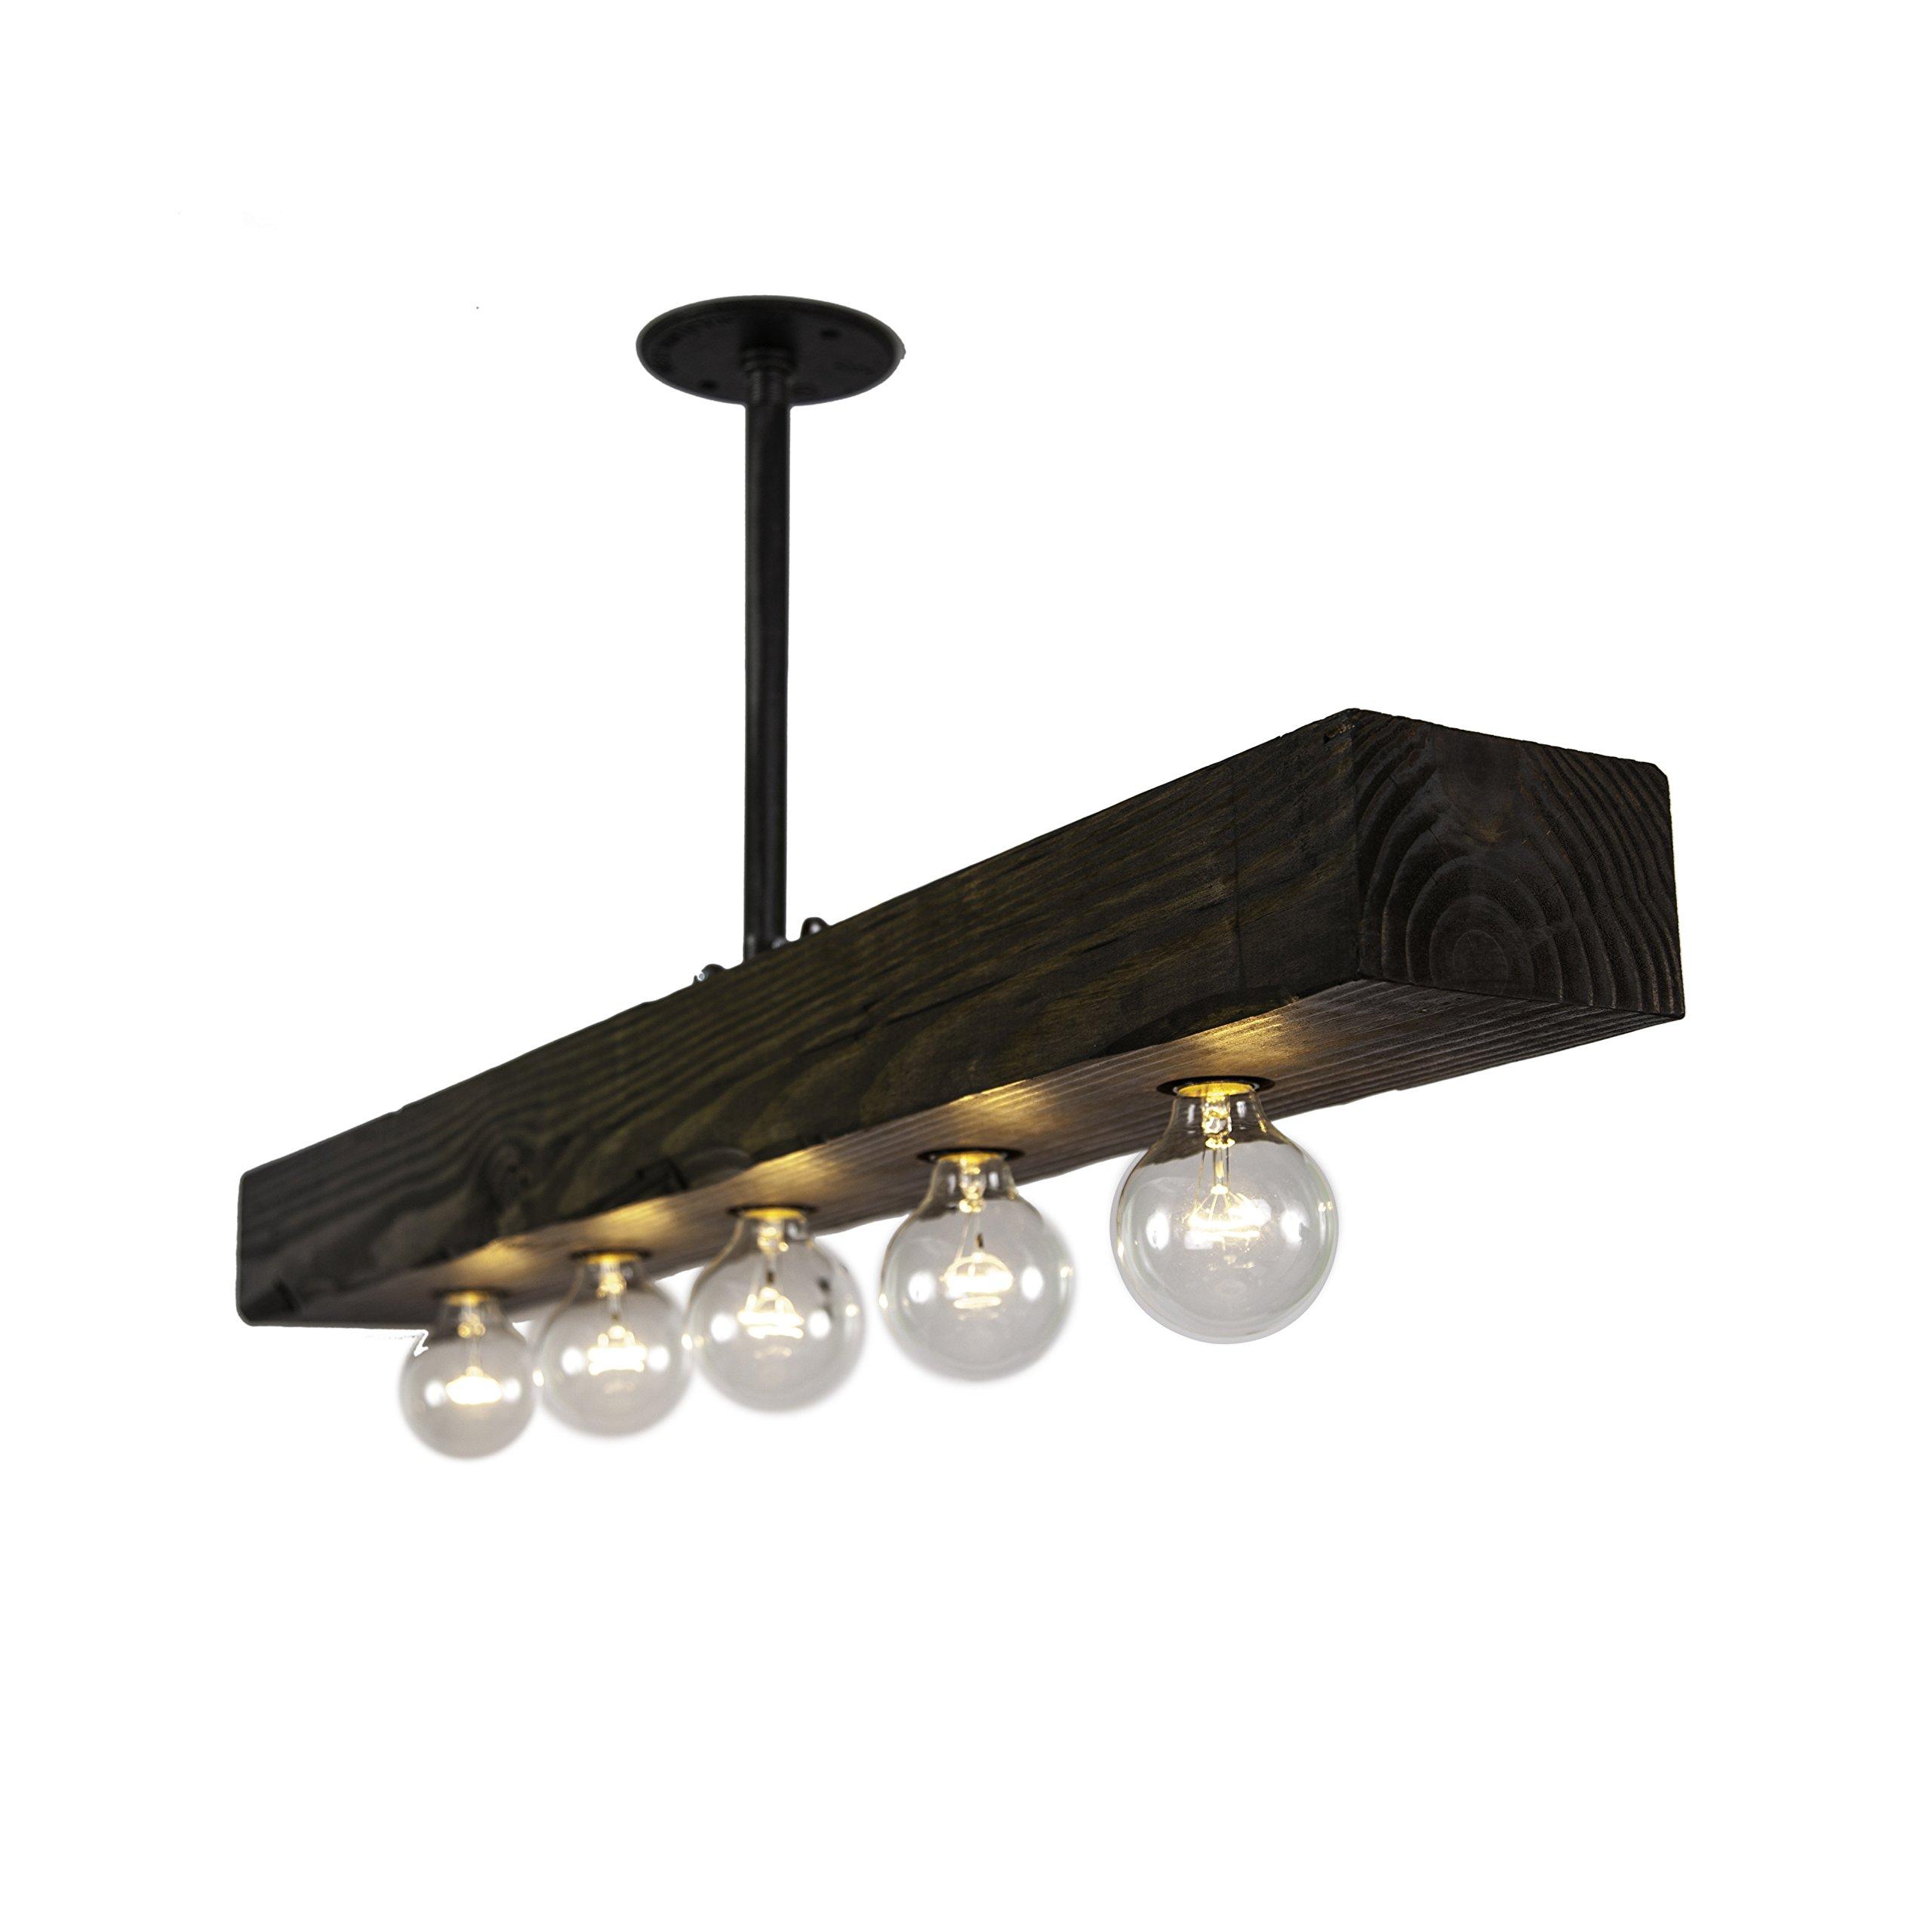 Recessed Wood Beam (5 Lights) by West Ninth Vintage